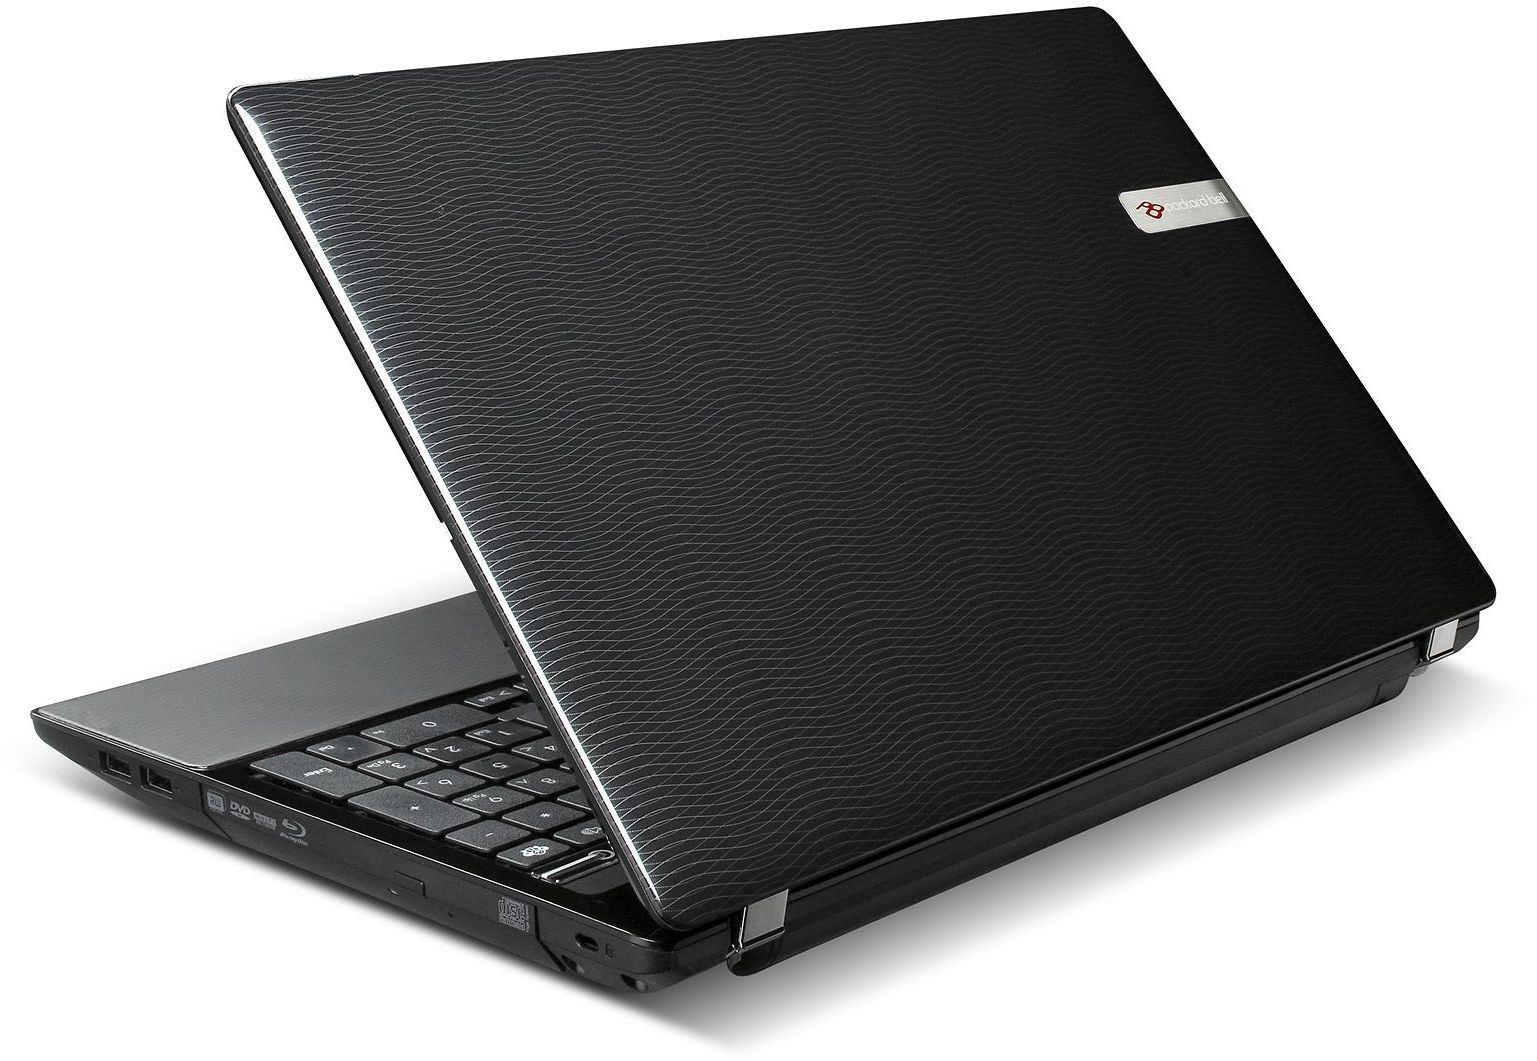 Packard Bell EasyNote TM – 2761